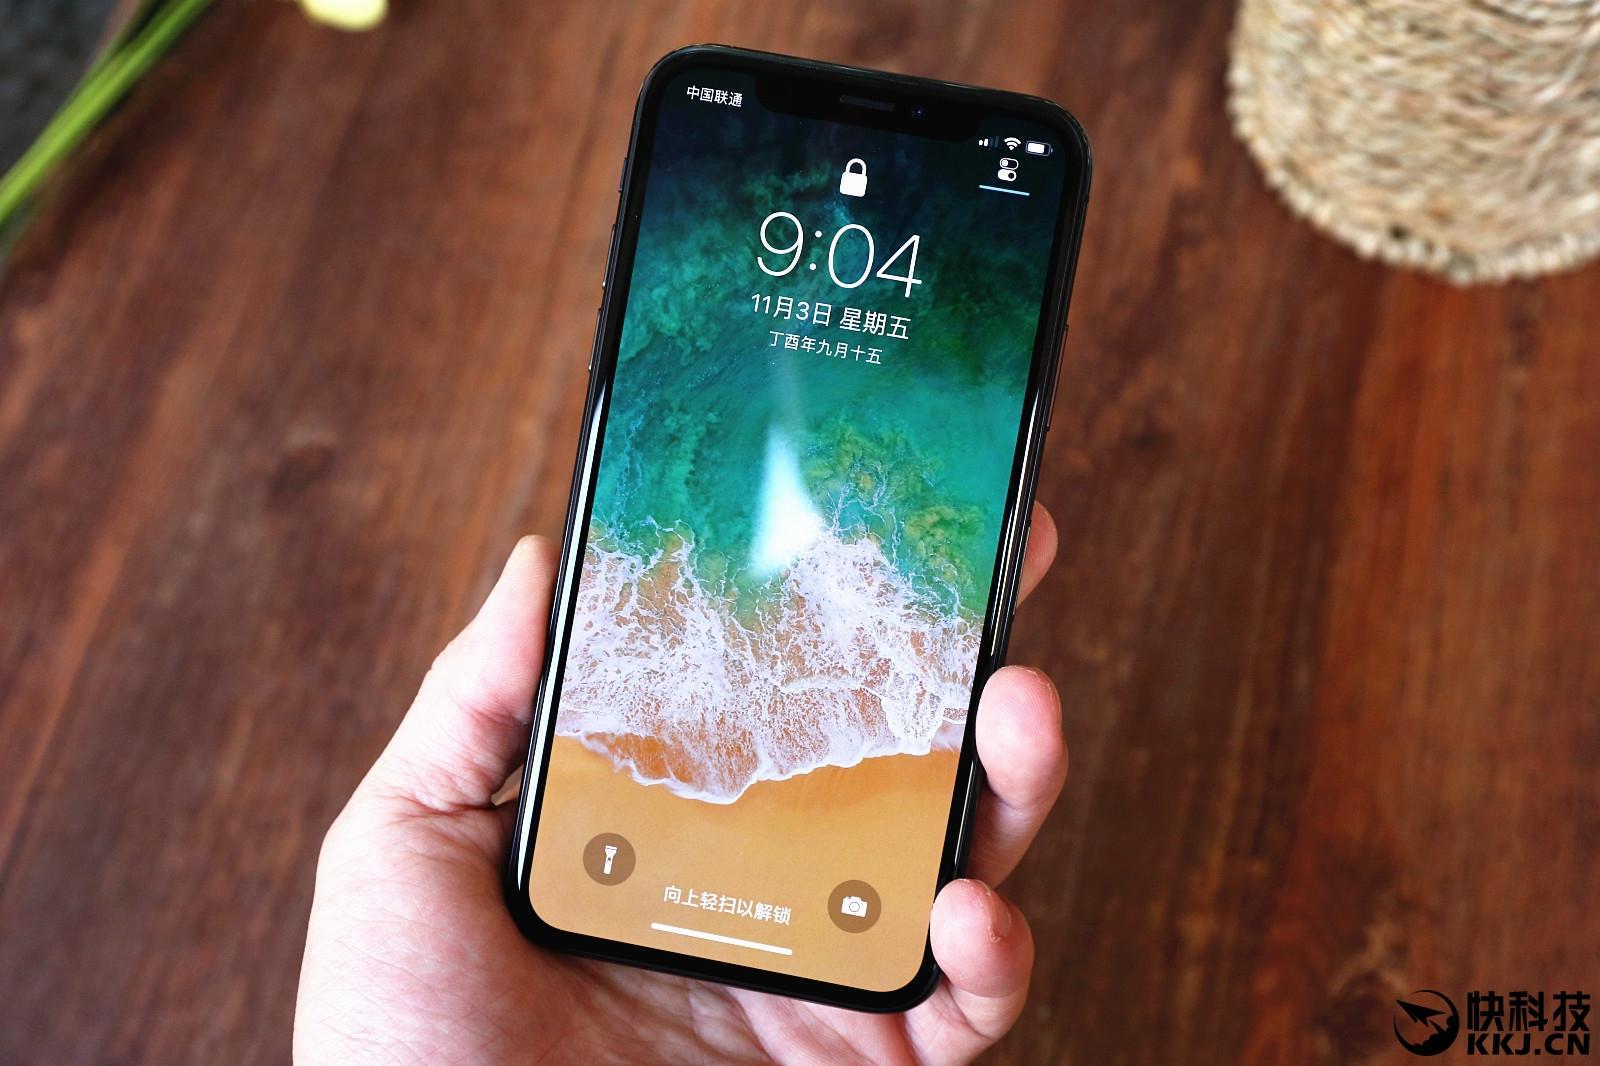 iPhoneX上最新的7种操作